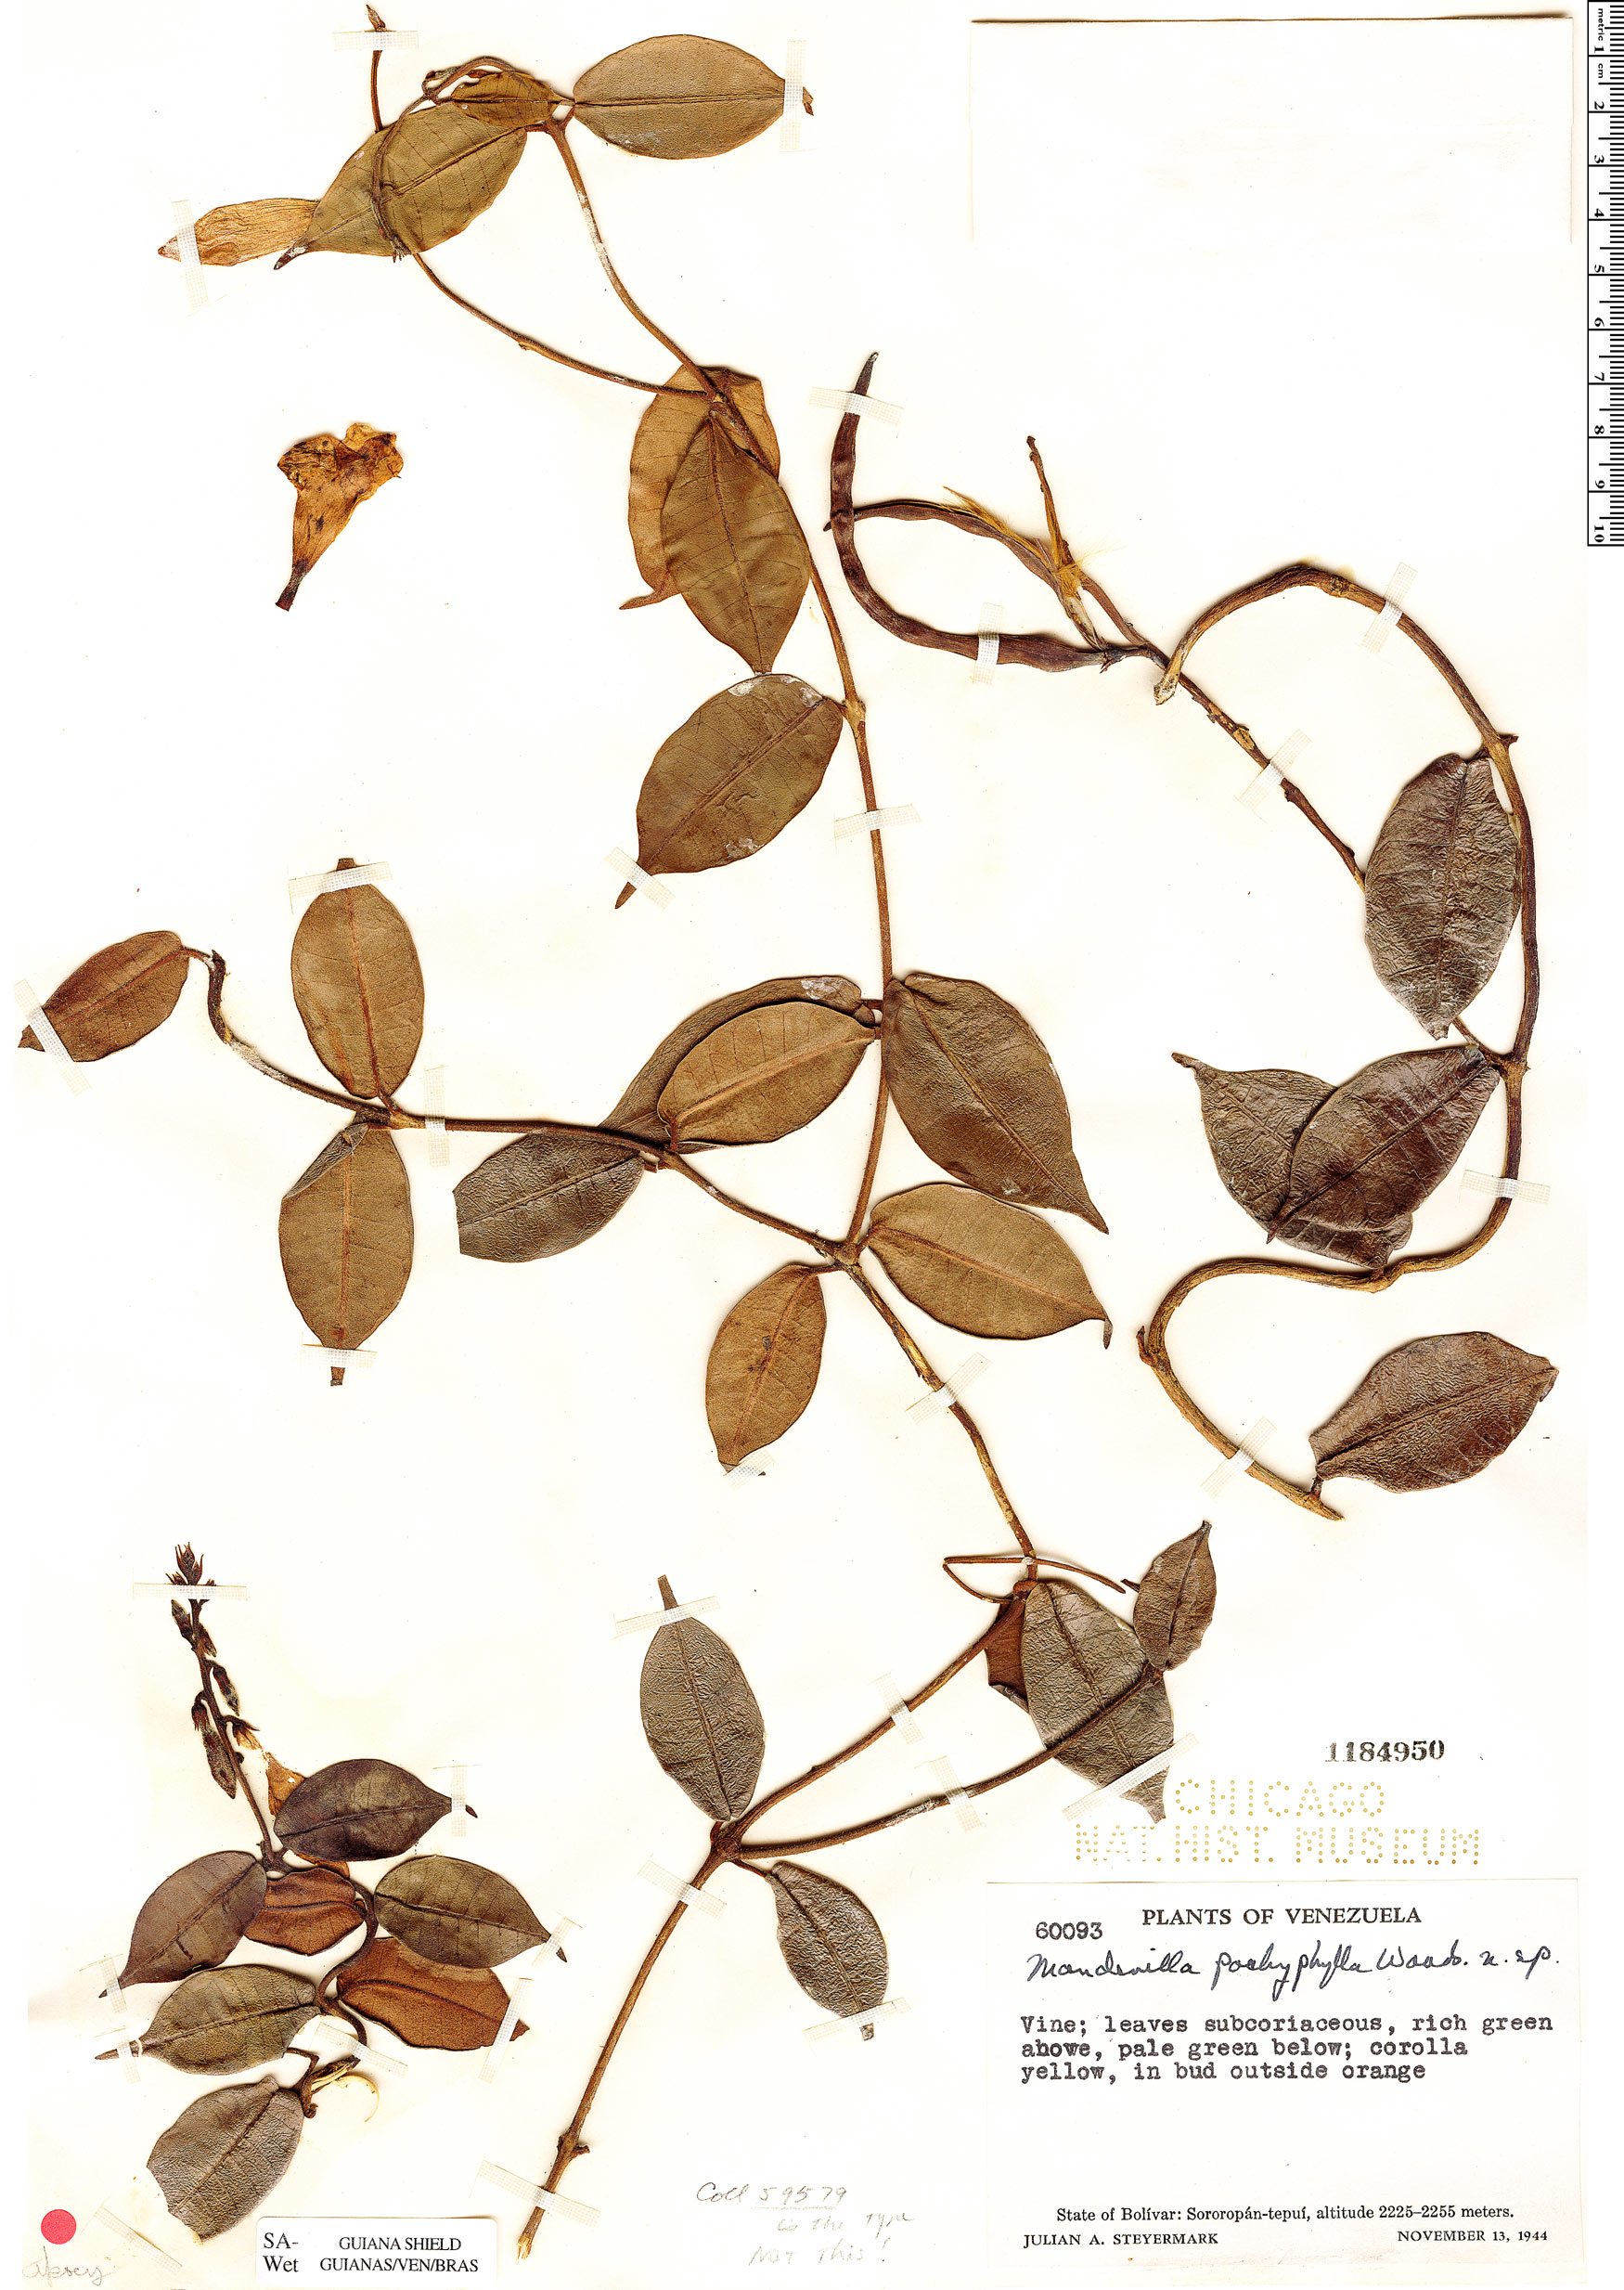 Specimen: Mandevilla pachyphylla